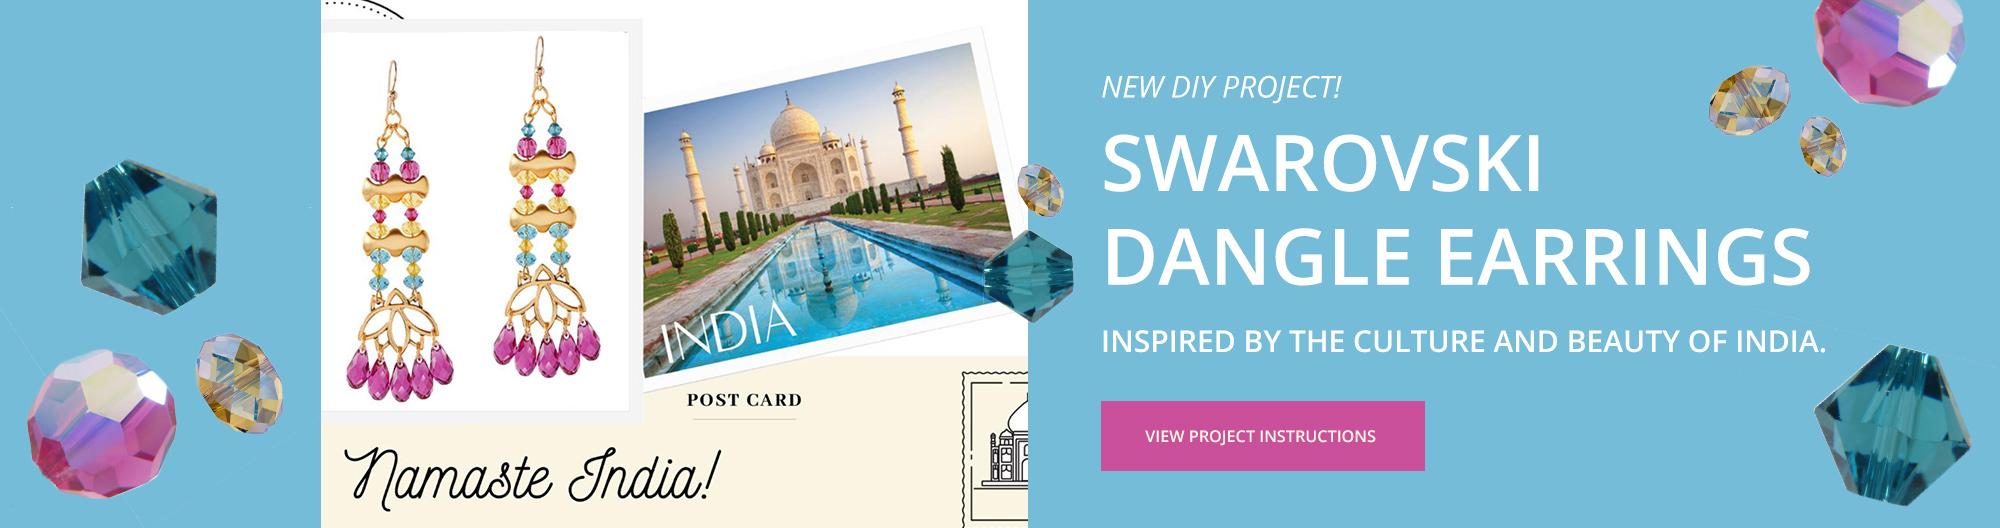 DIY Swarovski Projects - India Earrings